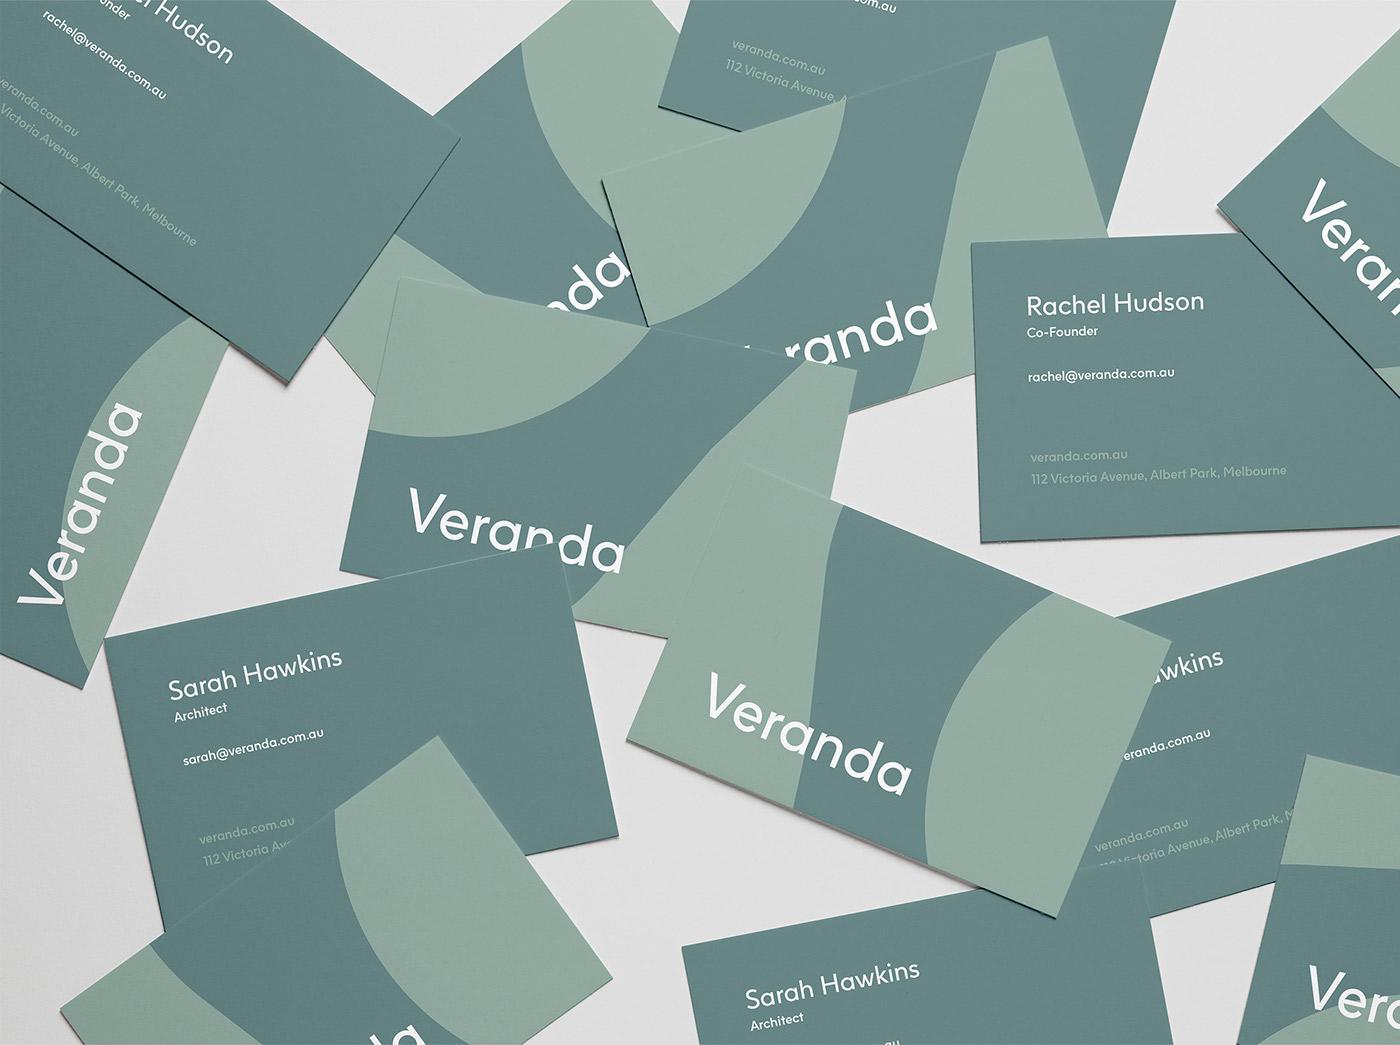 veranda-cards